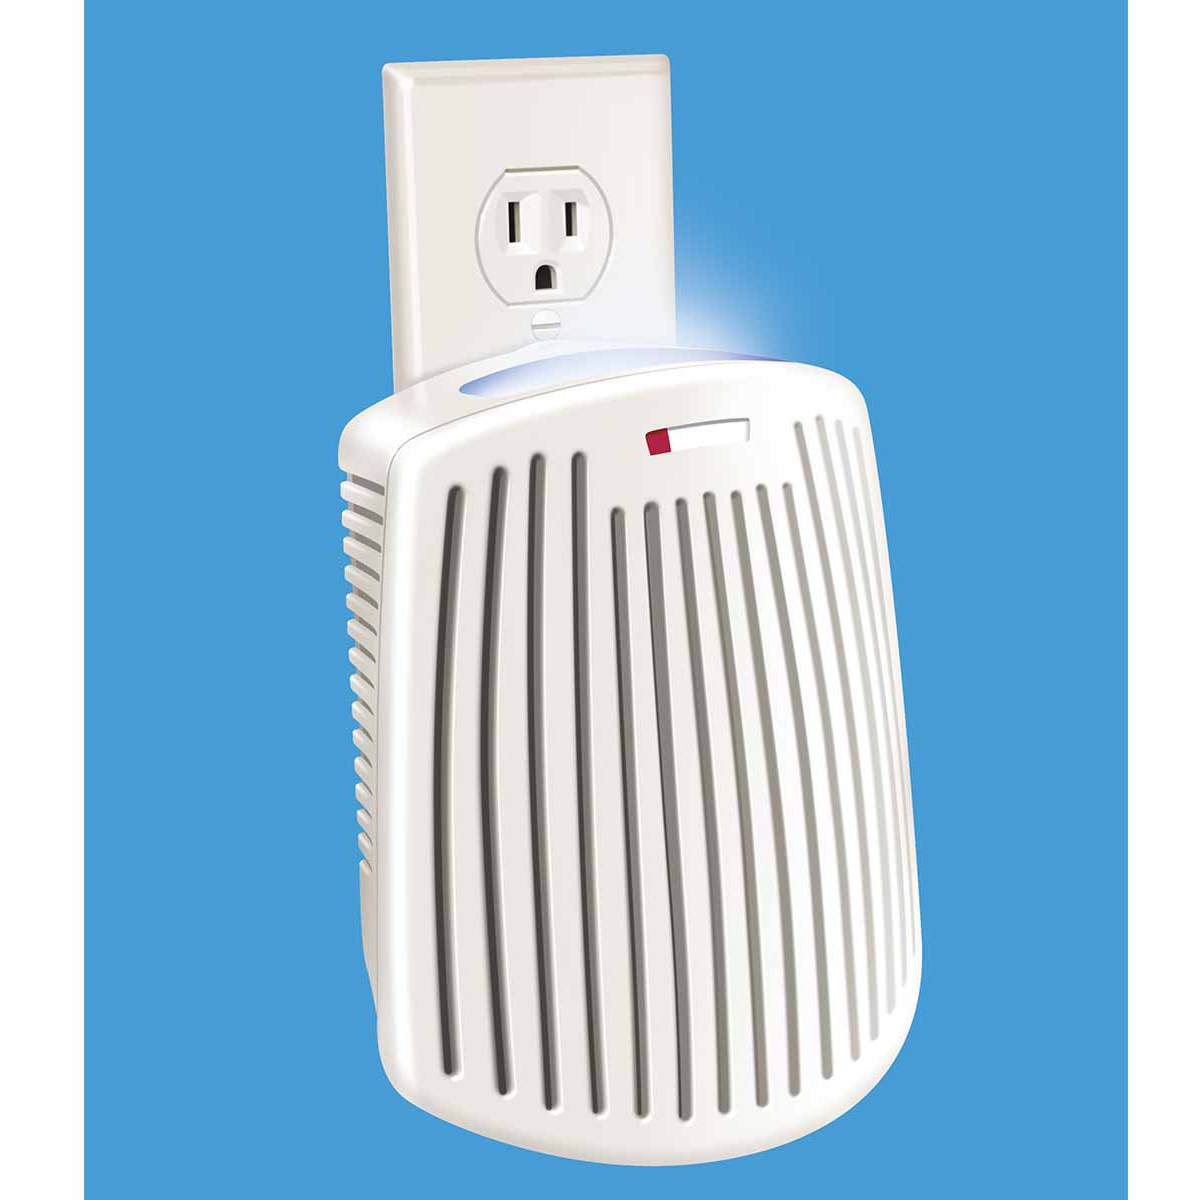 Febreze® True Air® All Purpose Odor Eliminator with Night Light (04531F)